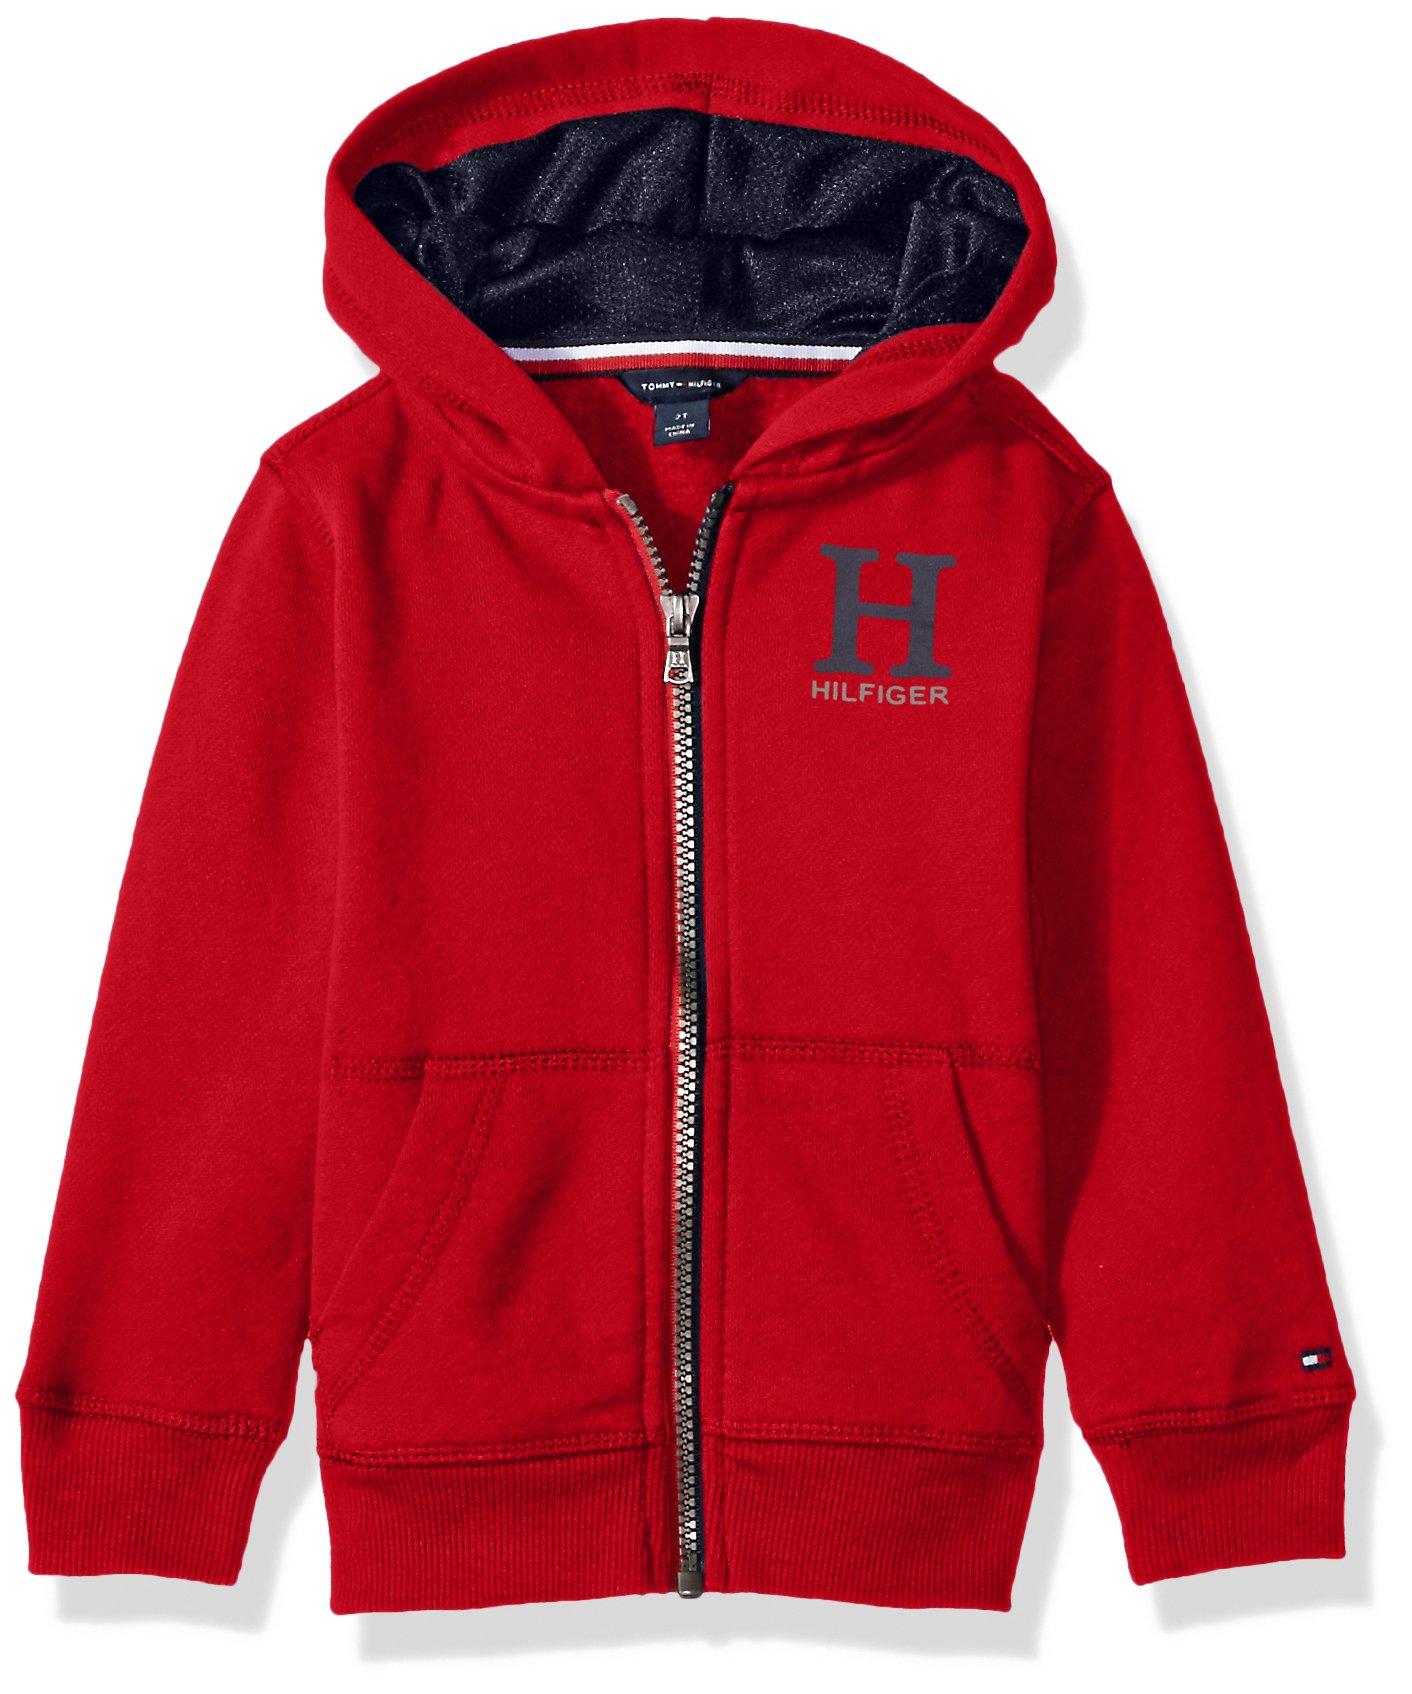 0556b91fcacb Galleon - Tommy Hilfiger Boys' Little Long Sleeve Matt Logo Zip Up Hoodie,  Bullseye Red, 6